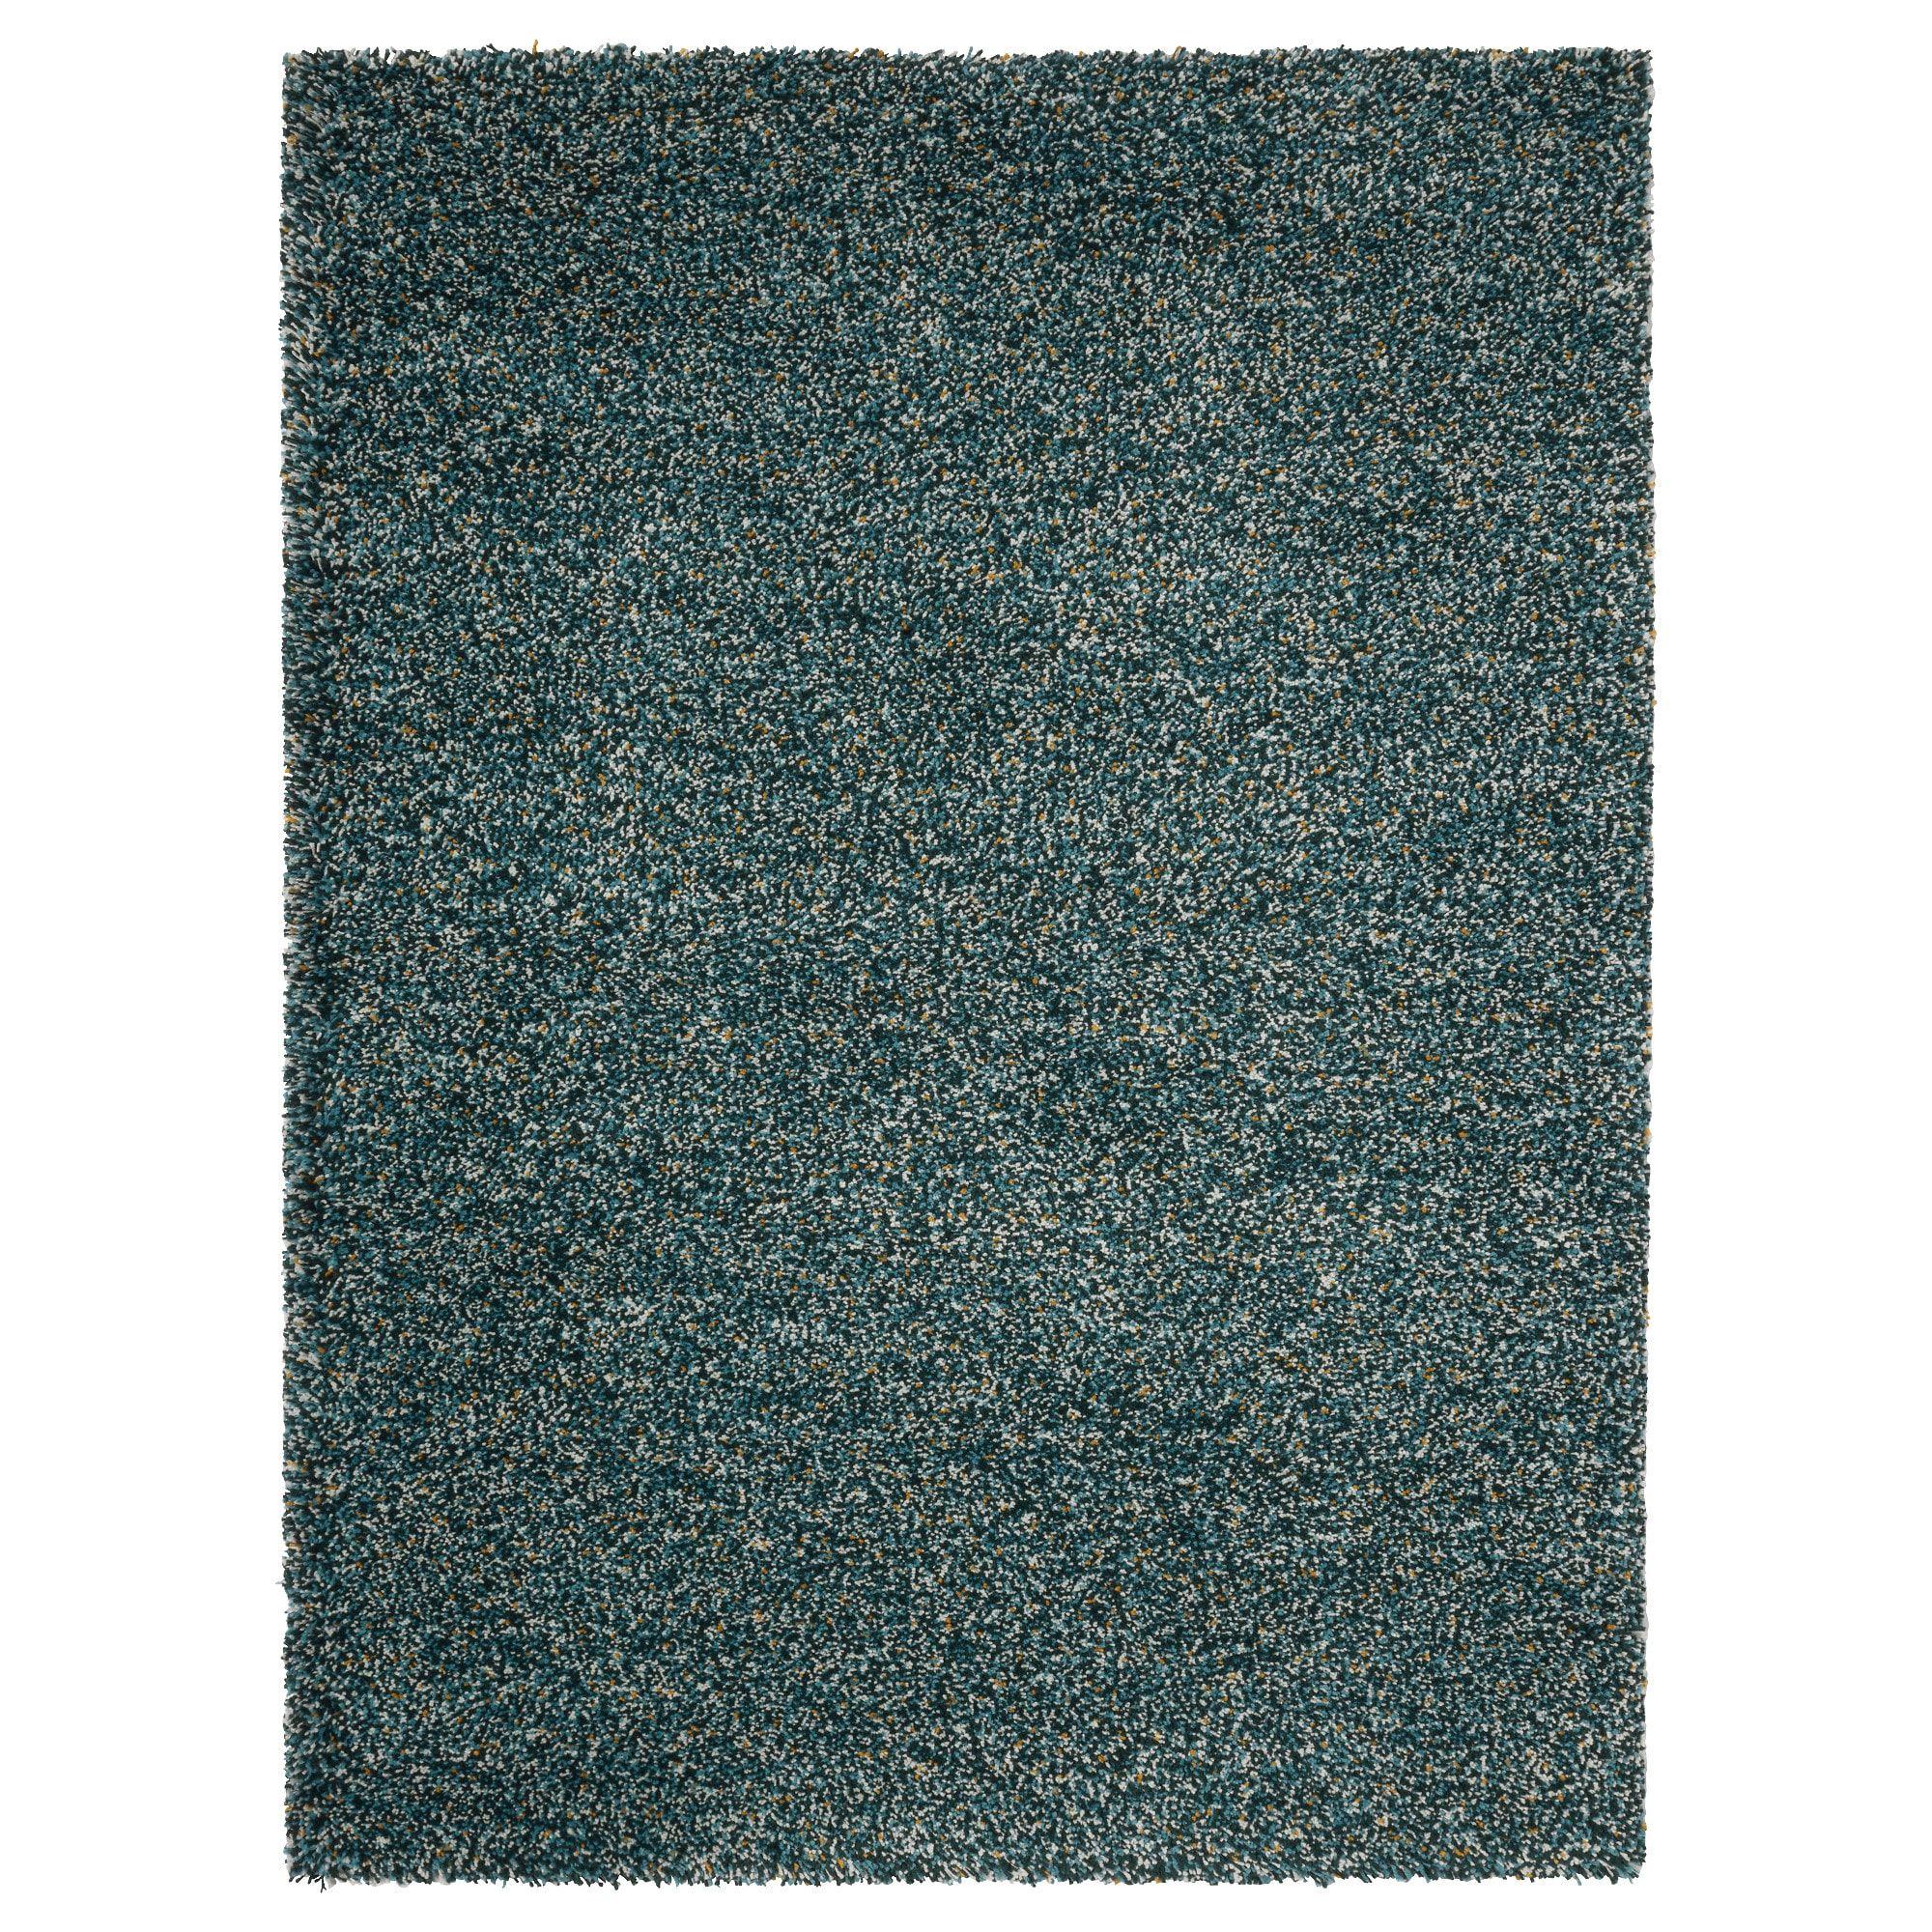 vindum rug high pile  bluegreen  ikea  rugs ikea